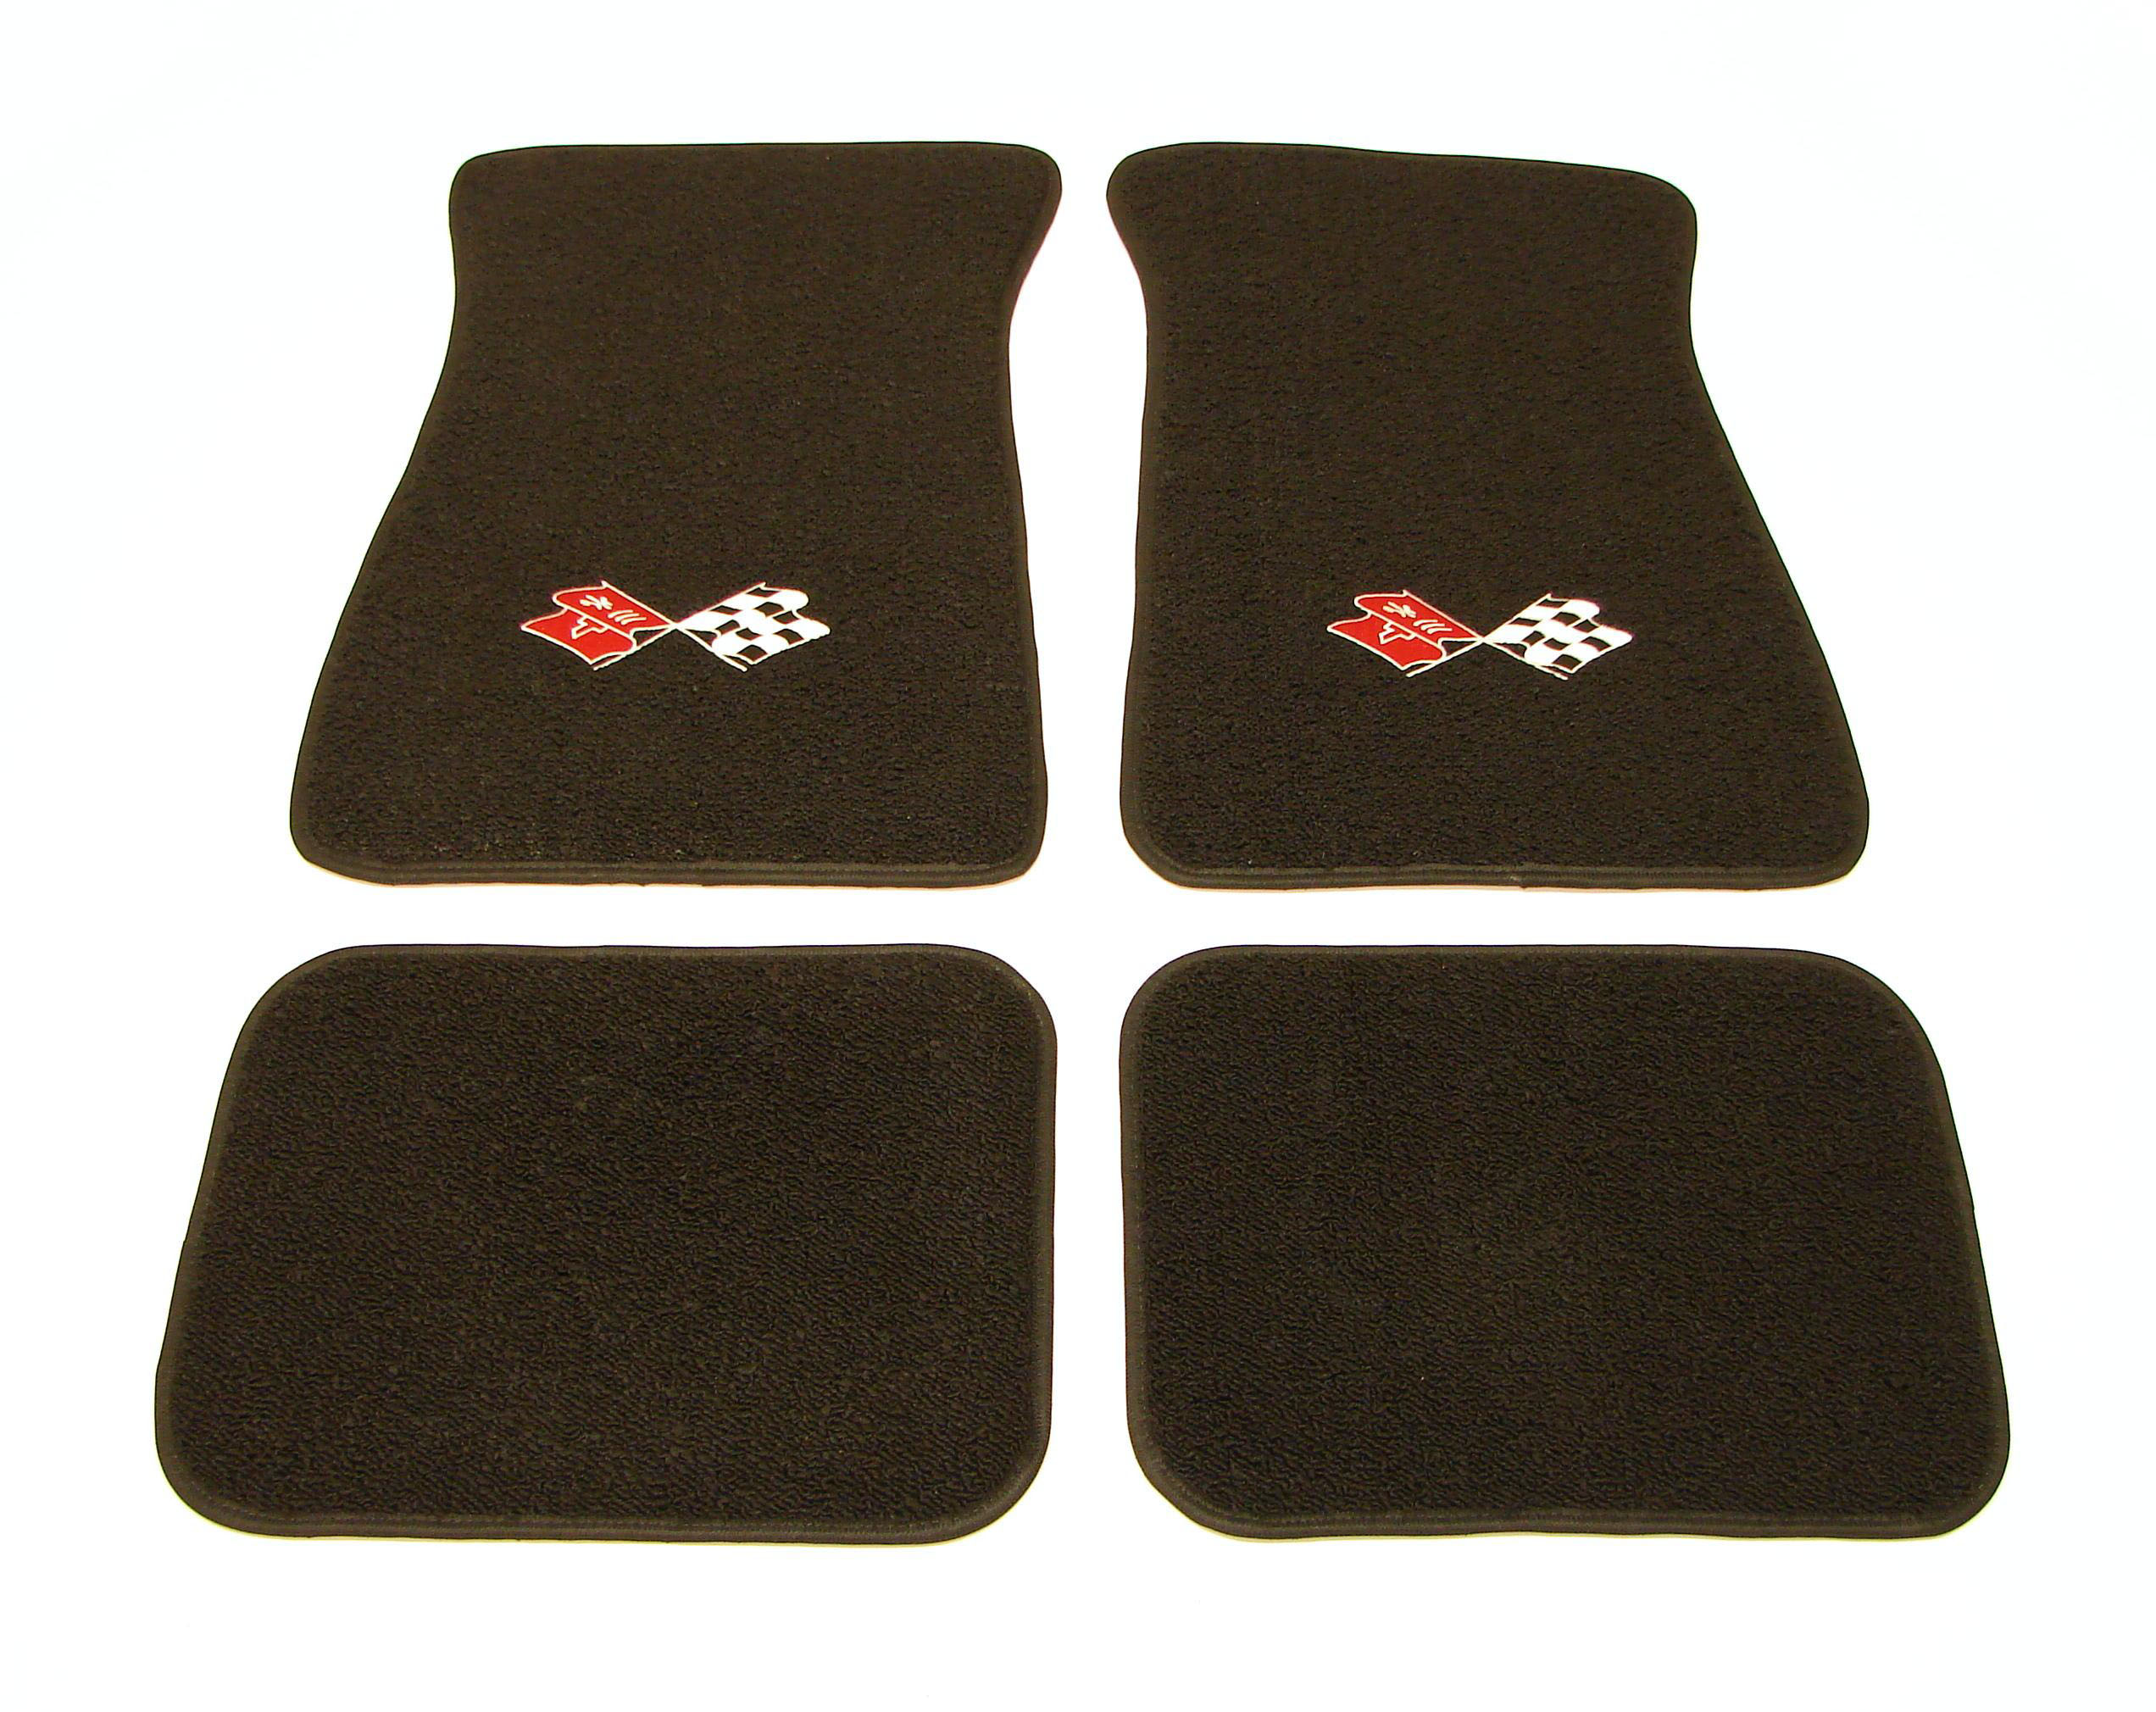 1967 1968 1969 camaro floor mats w cross flags logo made for 1969 camaro floor mats